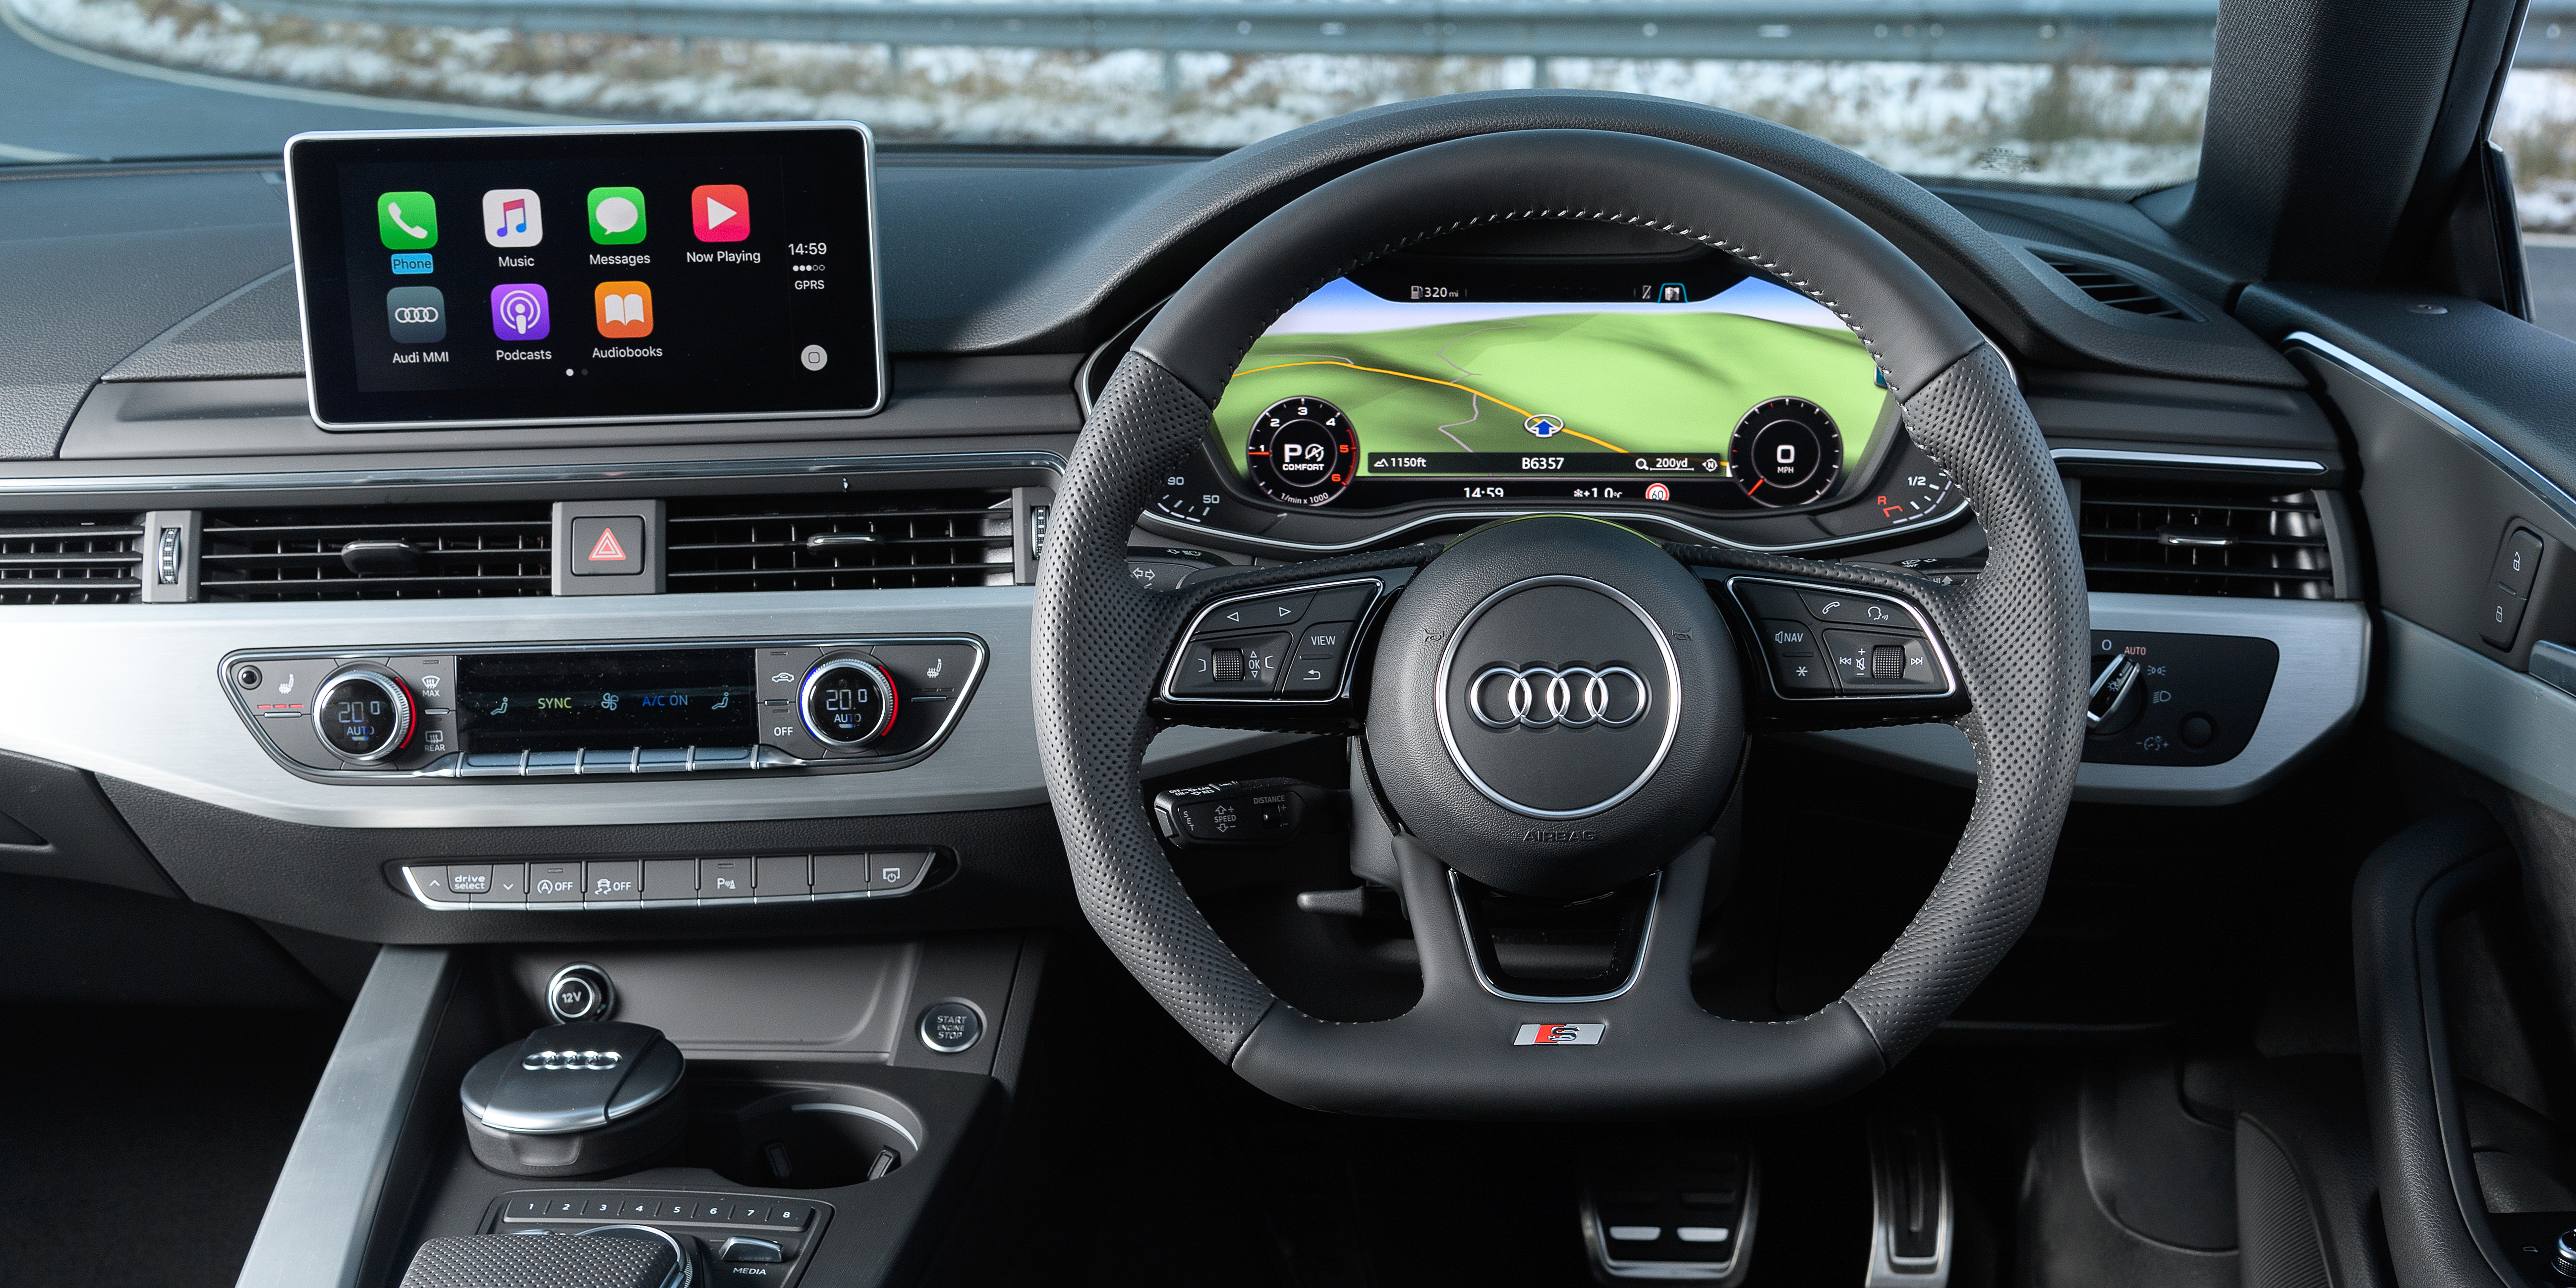 Audi A5 Sportback Interior & Infotainment | carwow